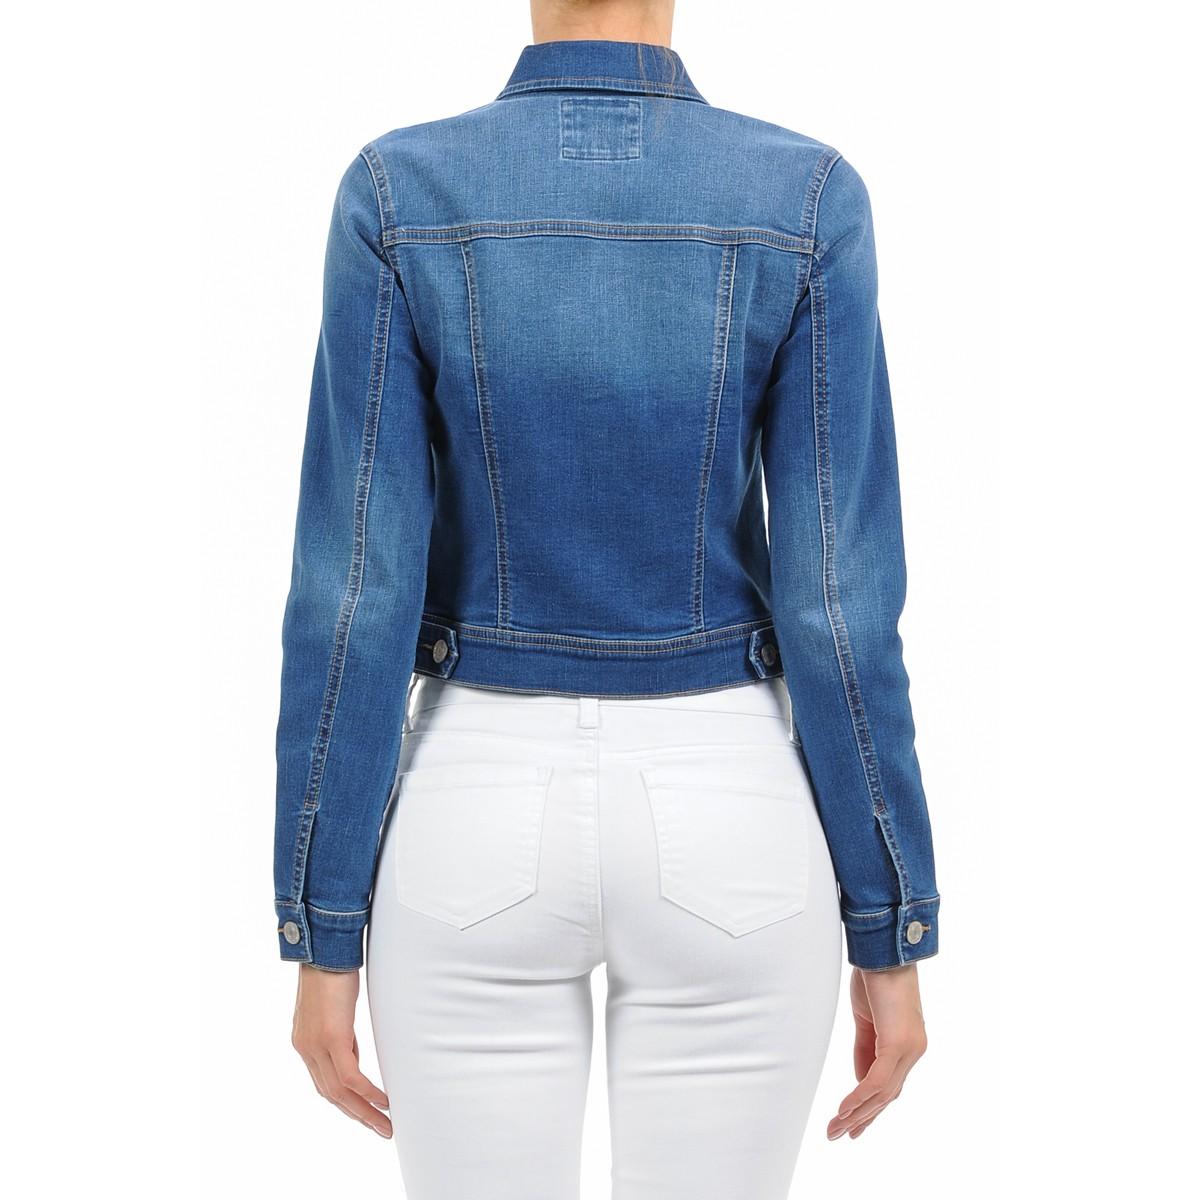 Women-039-s-Plus-Size-Cropped-Denim-Jackets-Long-Sleeve-Jean-Coats thumbnail 9